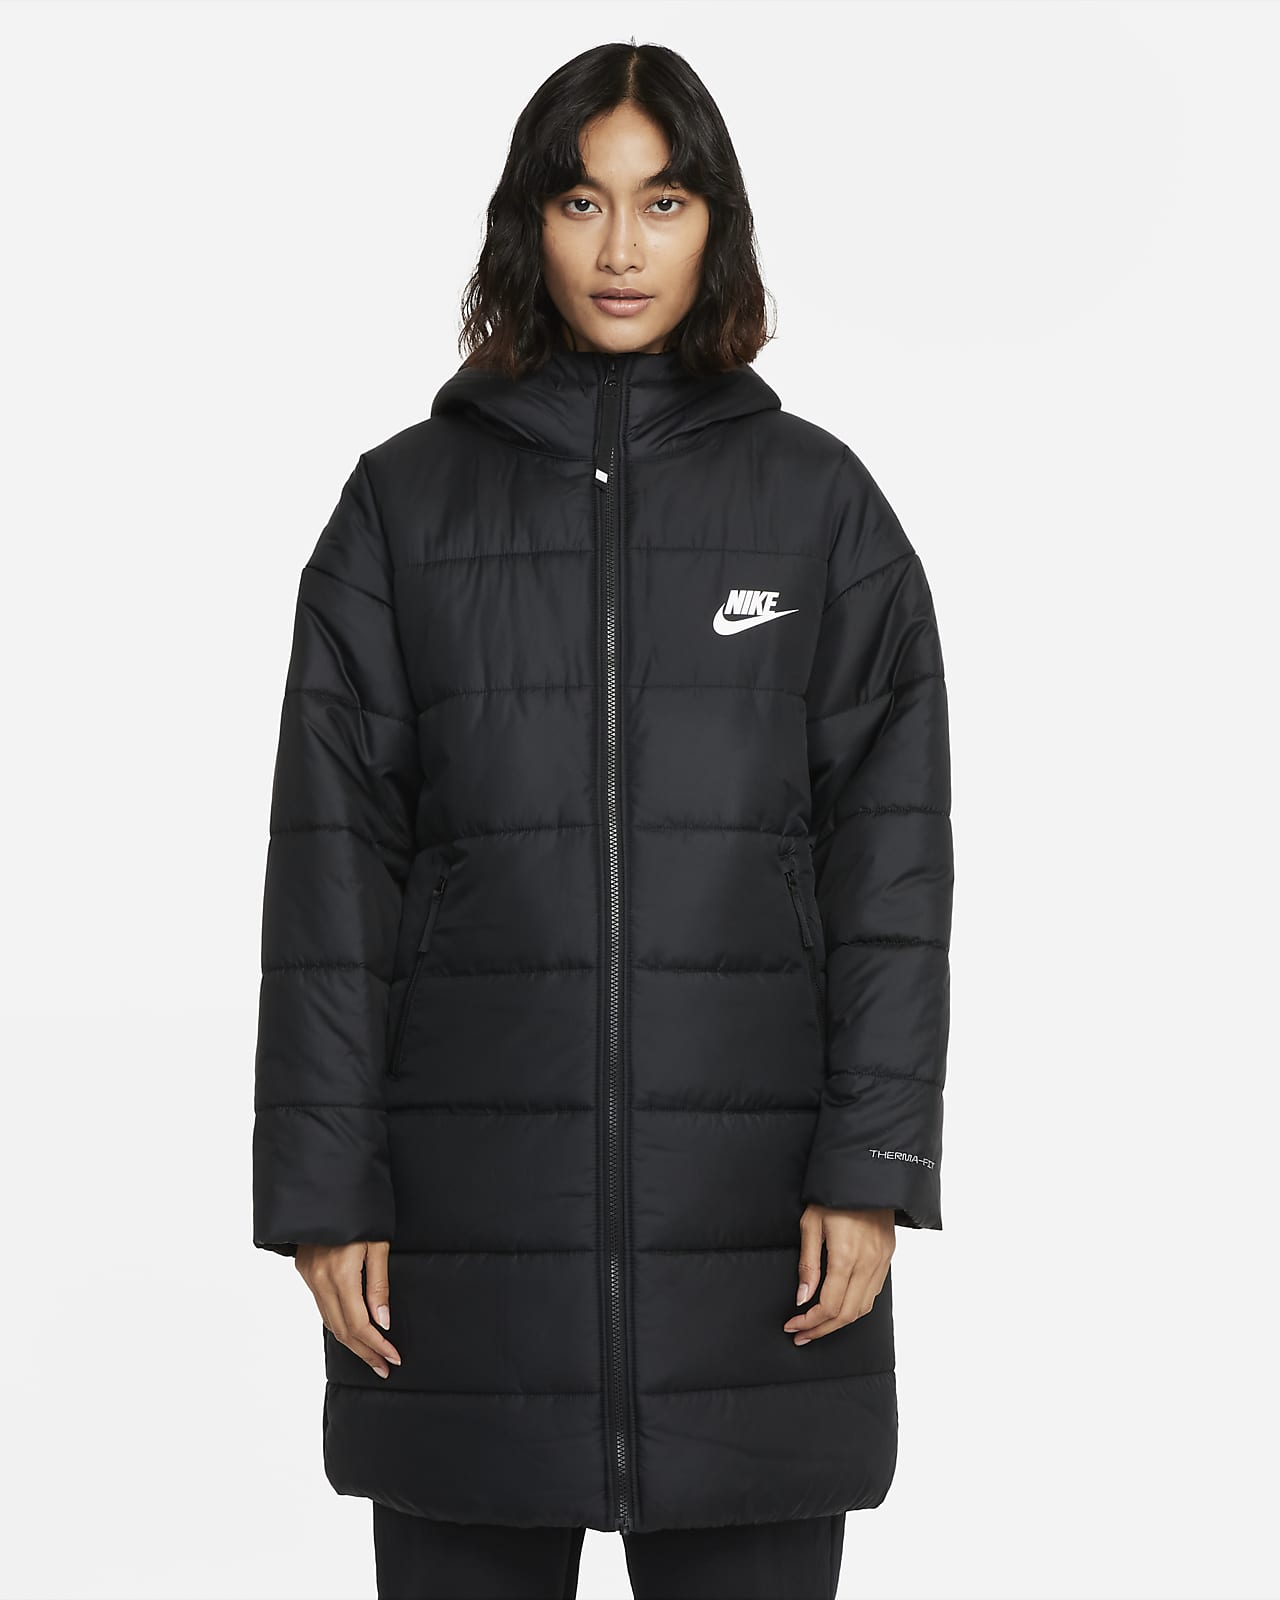 Женская парка с капюшоном Nike Sportswear Therma-FIT Repel